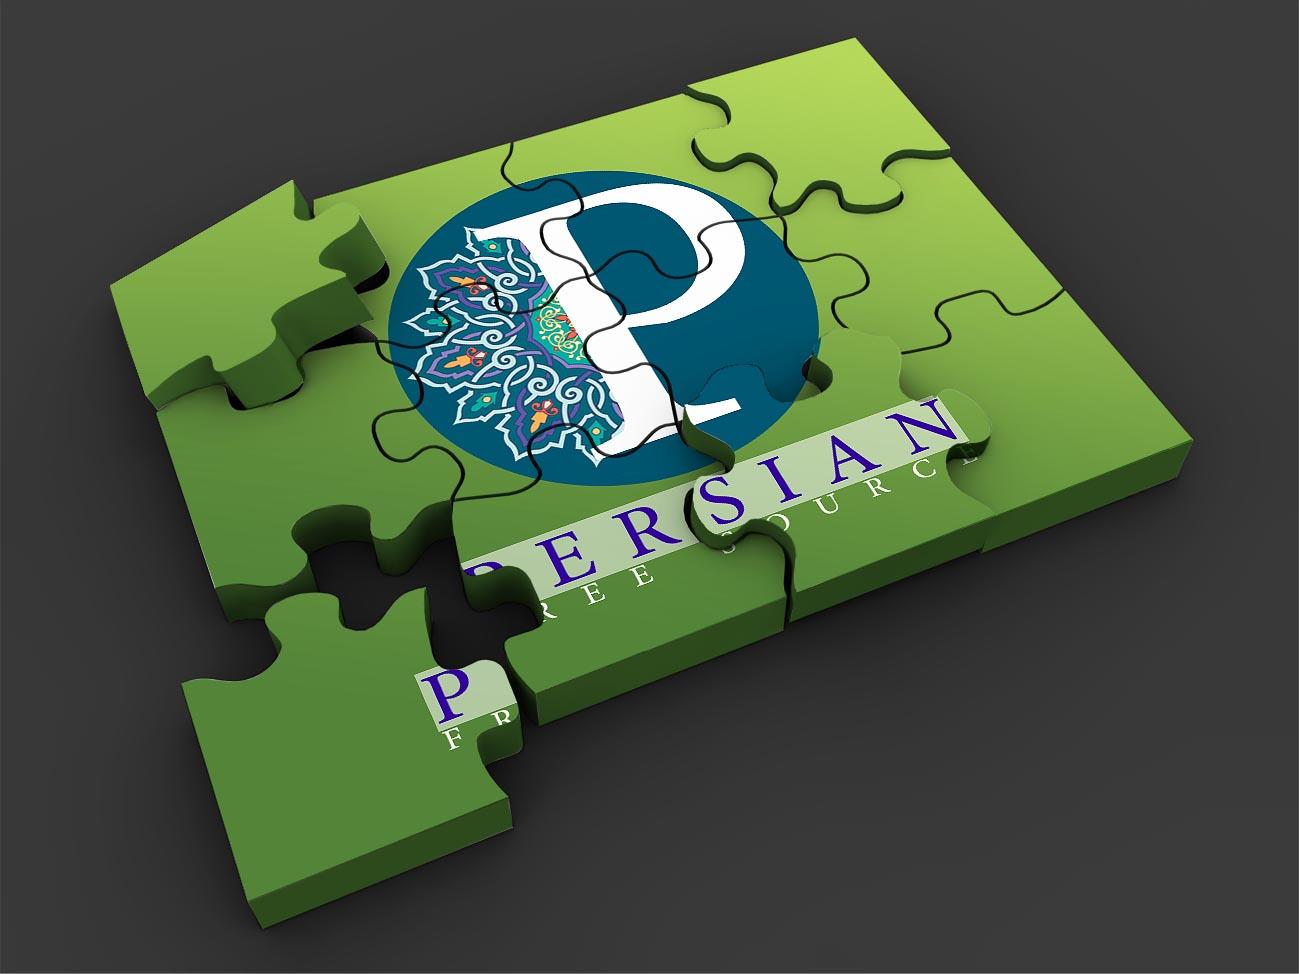 دانلود موکاپ پازل سه بعدی Fractma 3D Jigsaw Puzzle